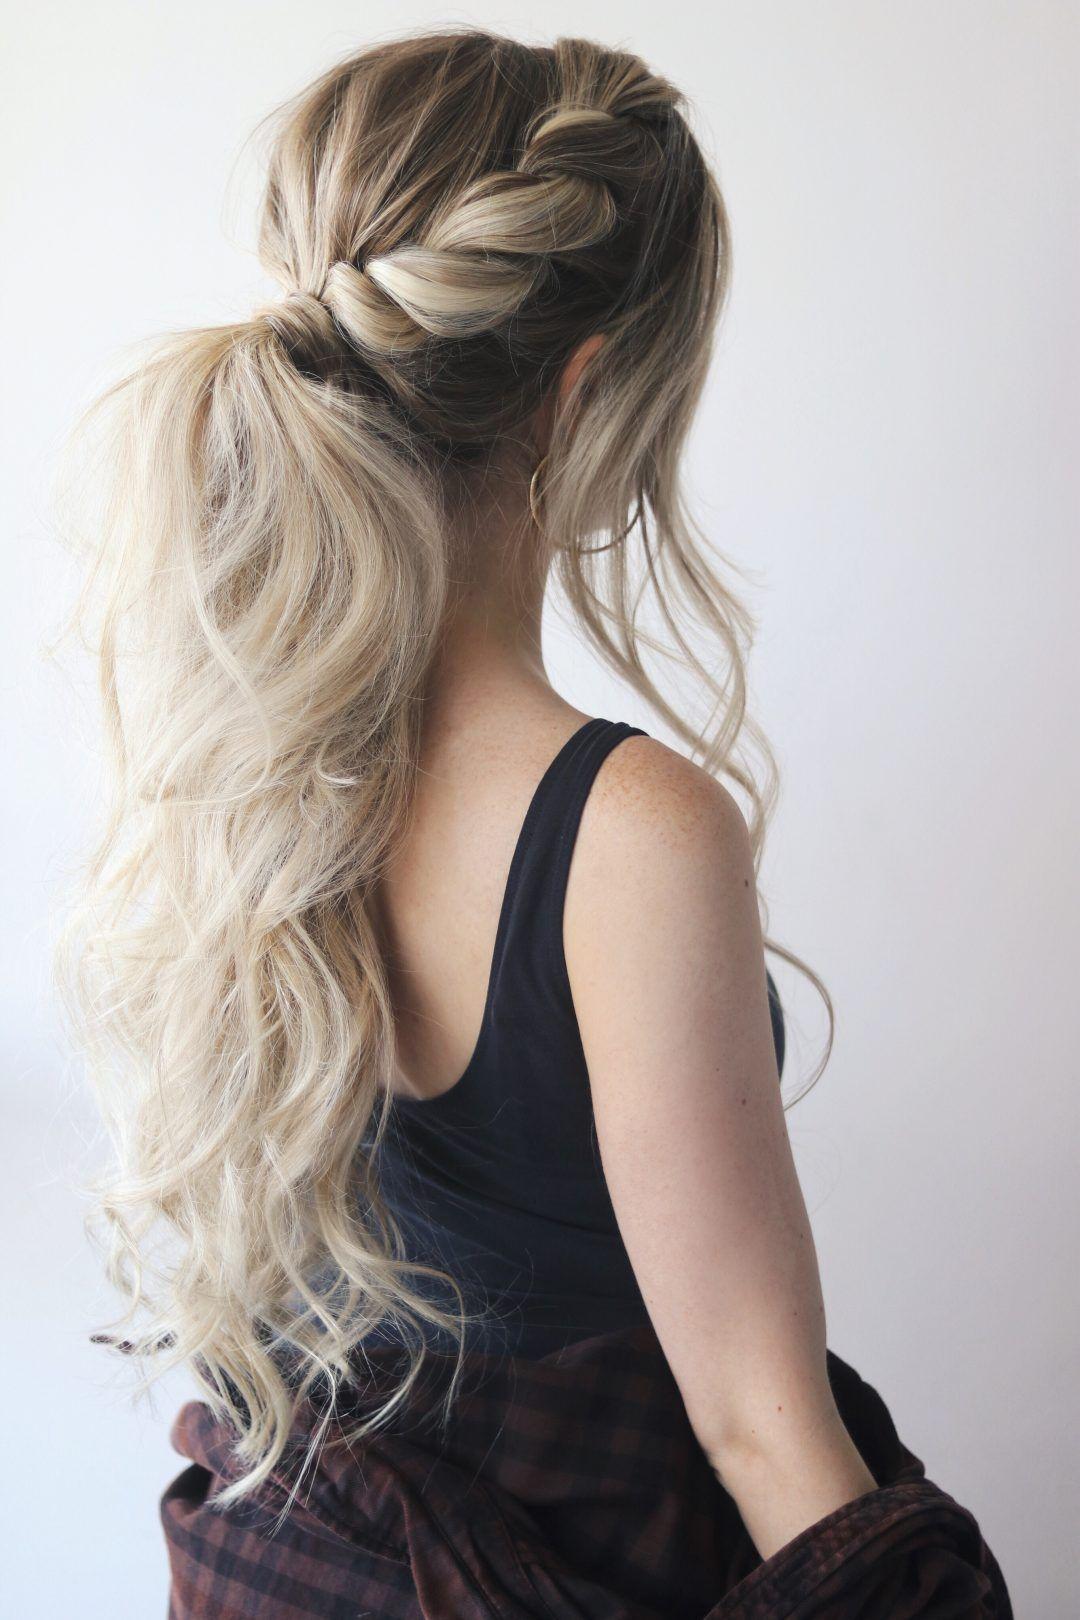 EASY PONYTAIL HAIR TUTORIAL - Alex Gaboury #ponytailhairstyles